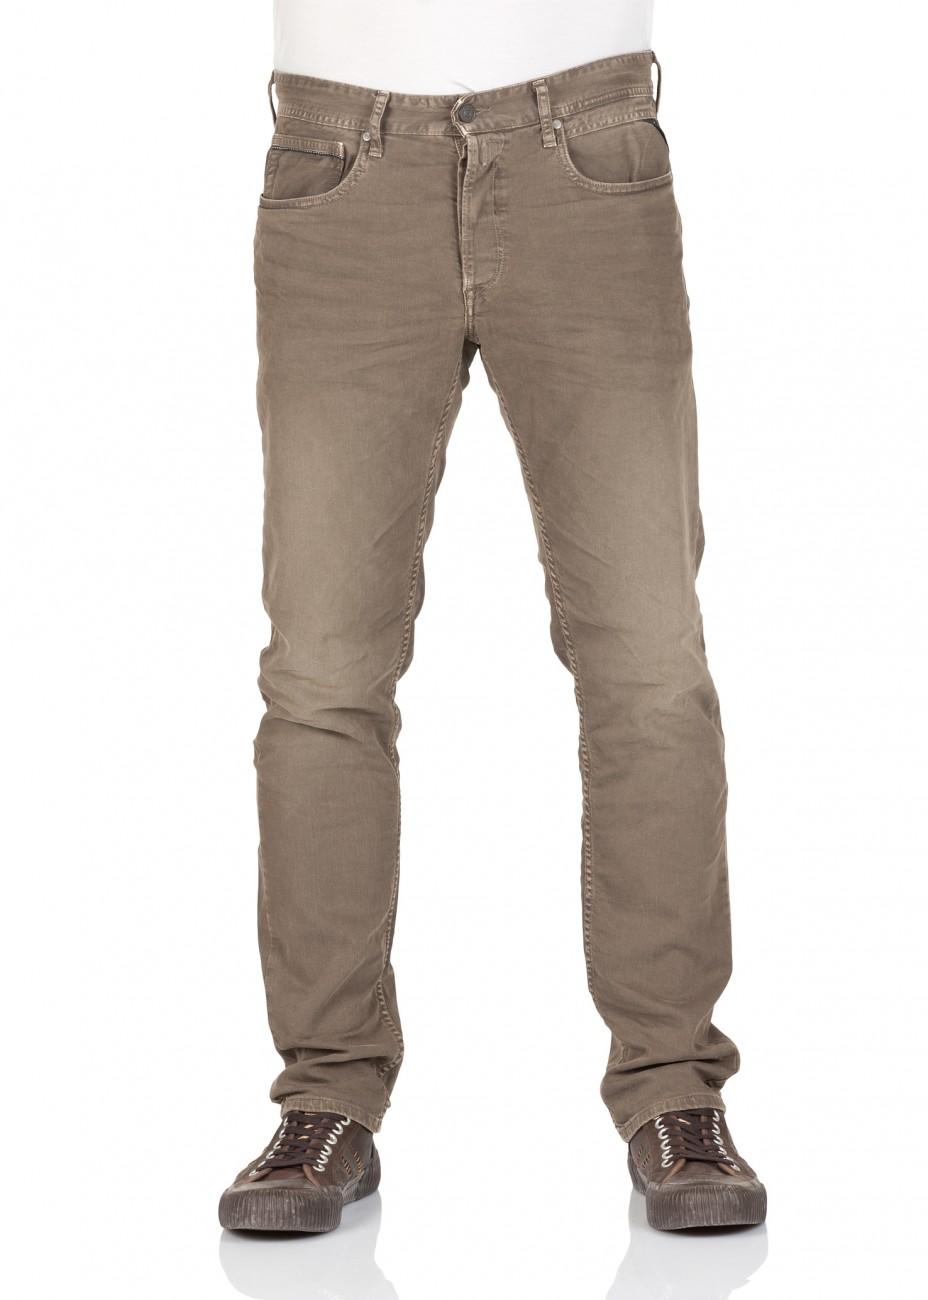 replay herren jeans grover straight fit slim leg braun mud ebay. Black Bedroom Furniture Sets. Home Design Ideas